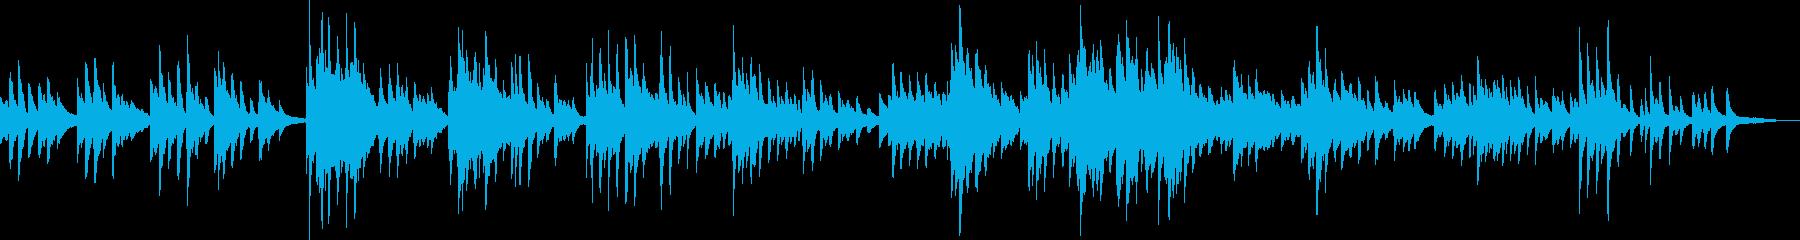 Remaining (piano ballad, sad, sad)'s reproduced waveform